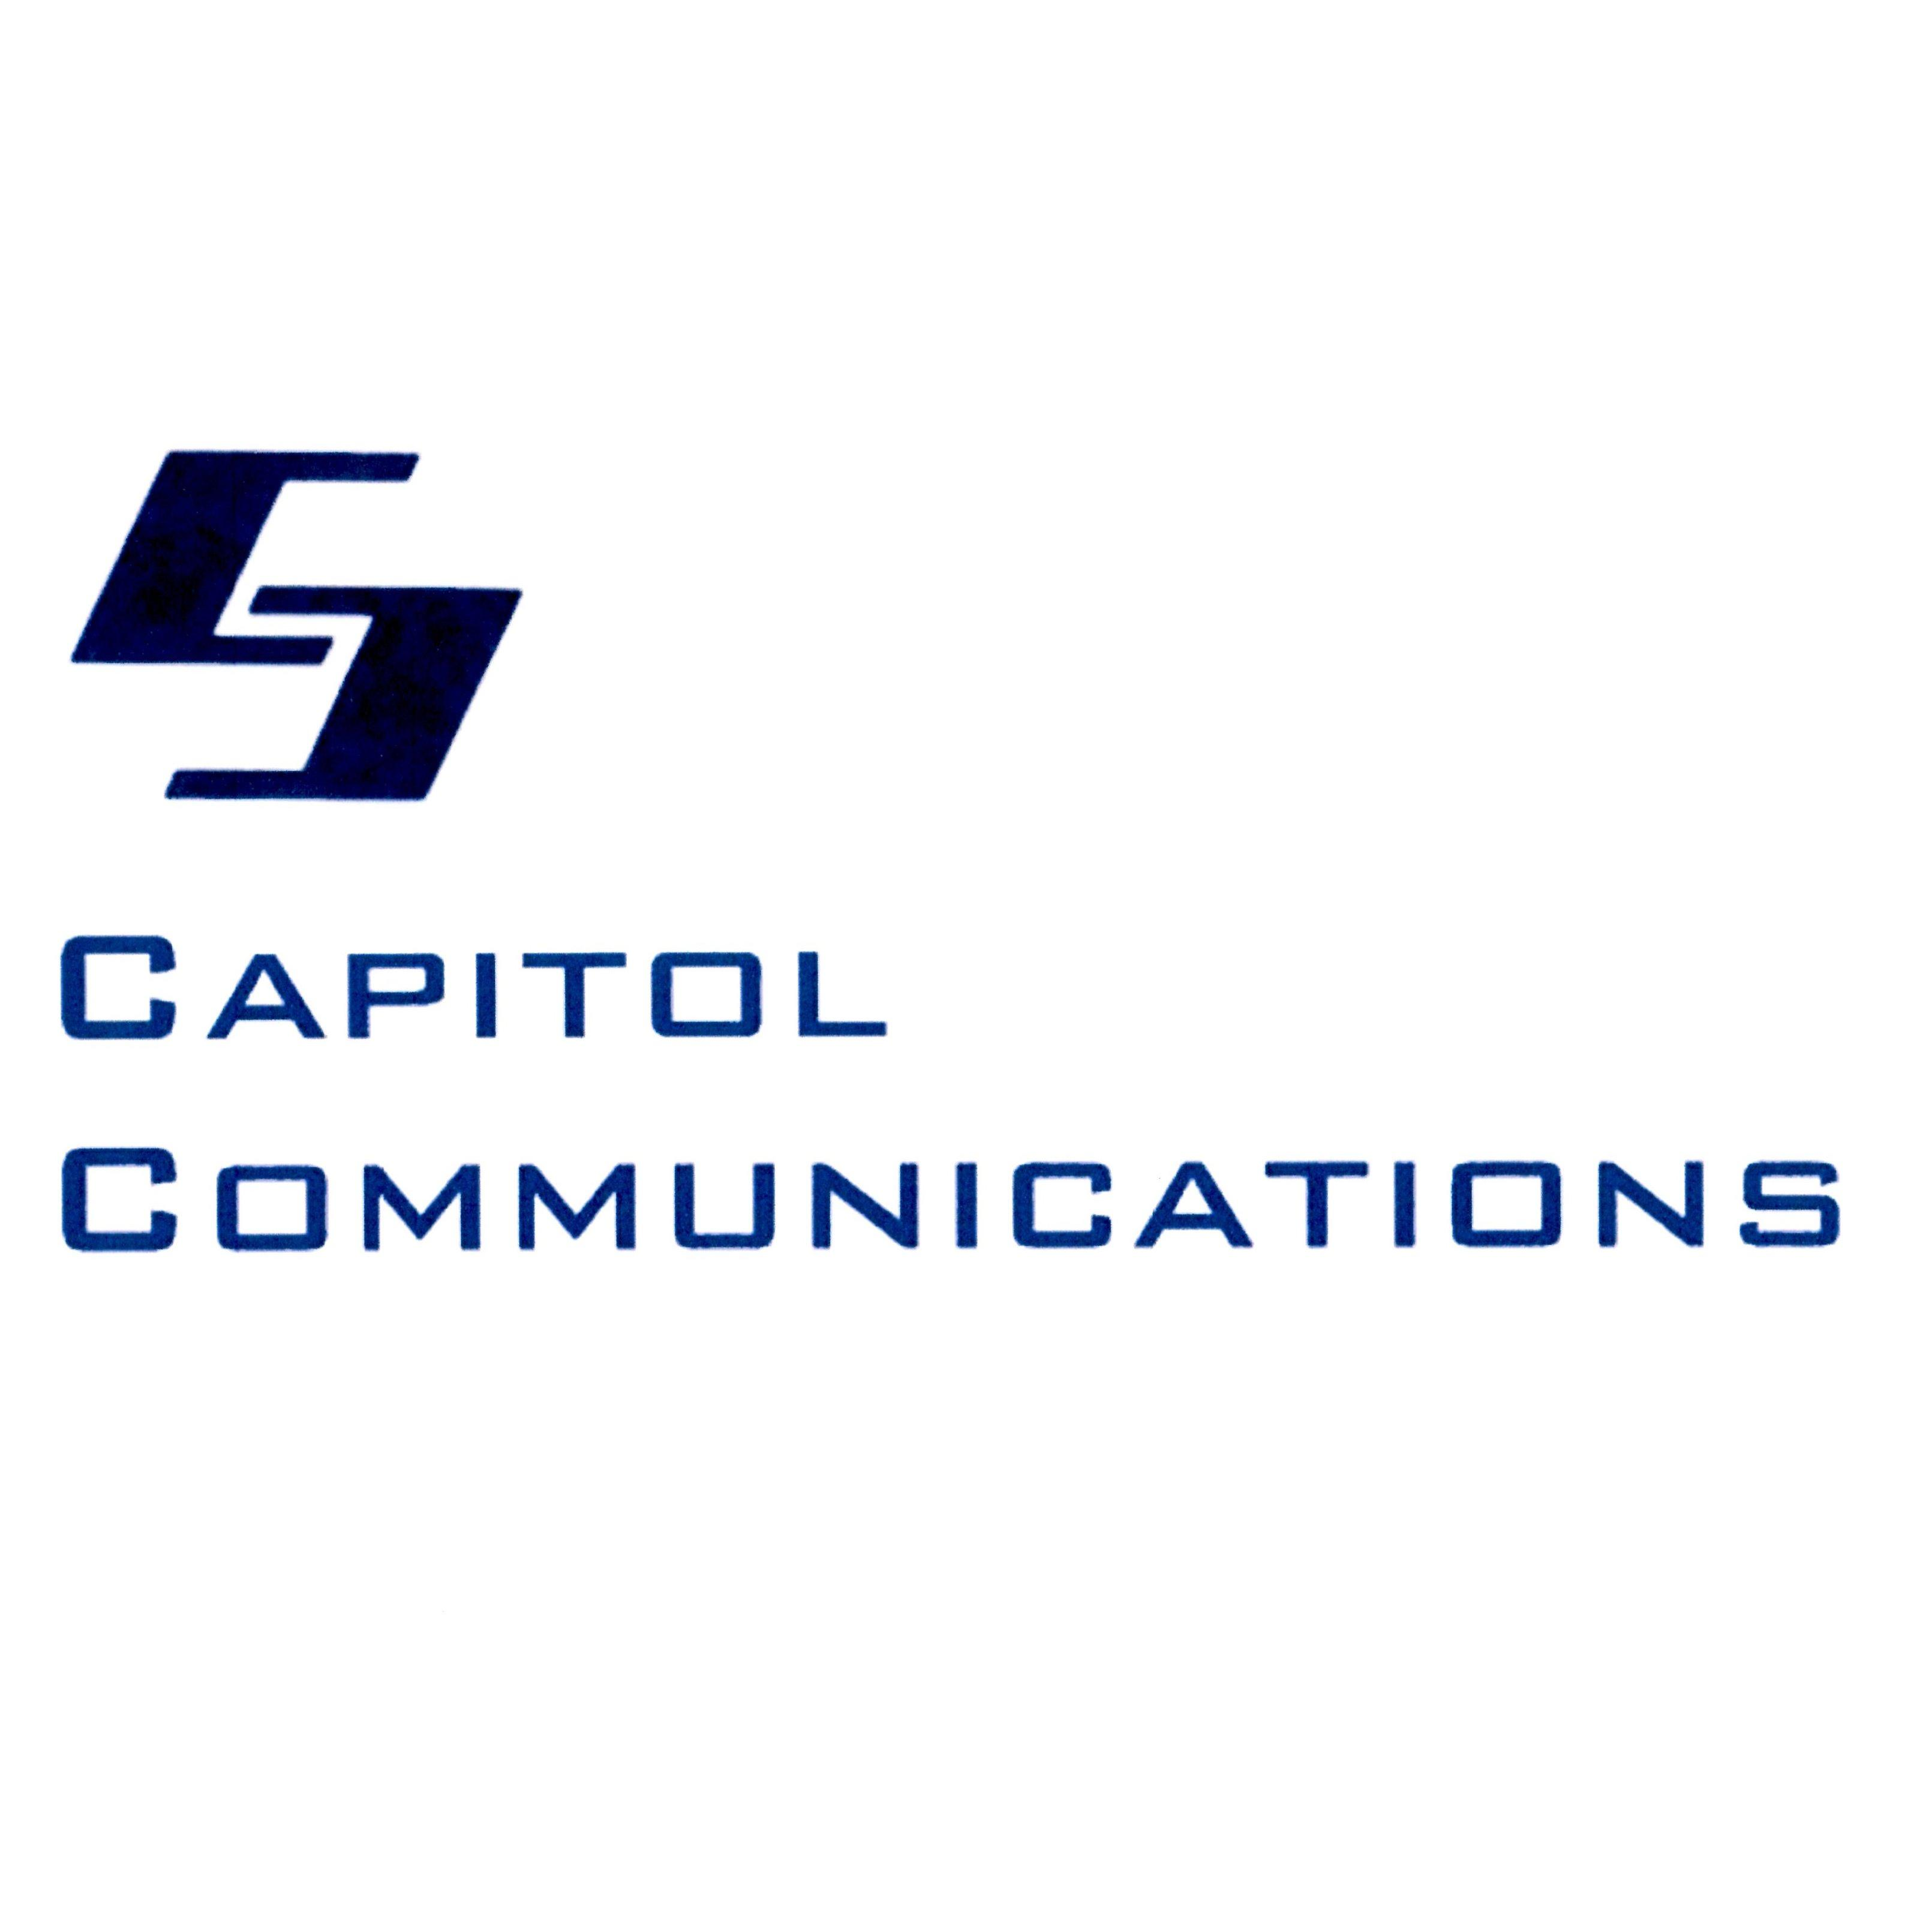 Capitol Communications